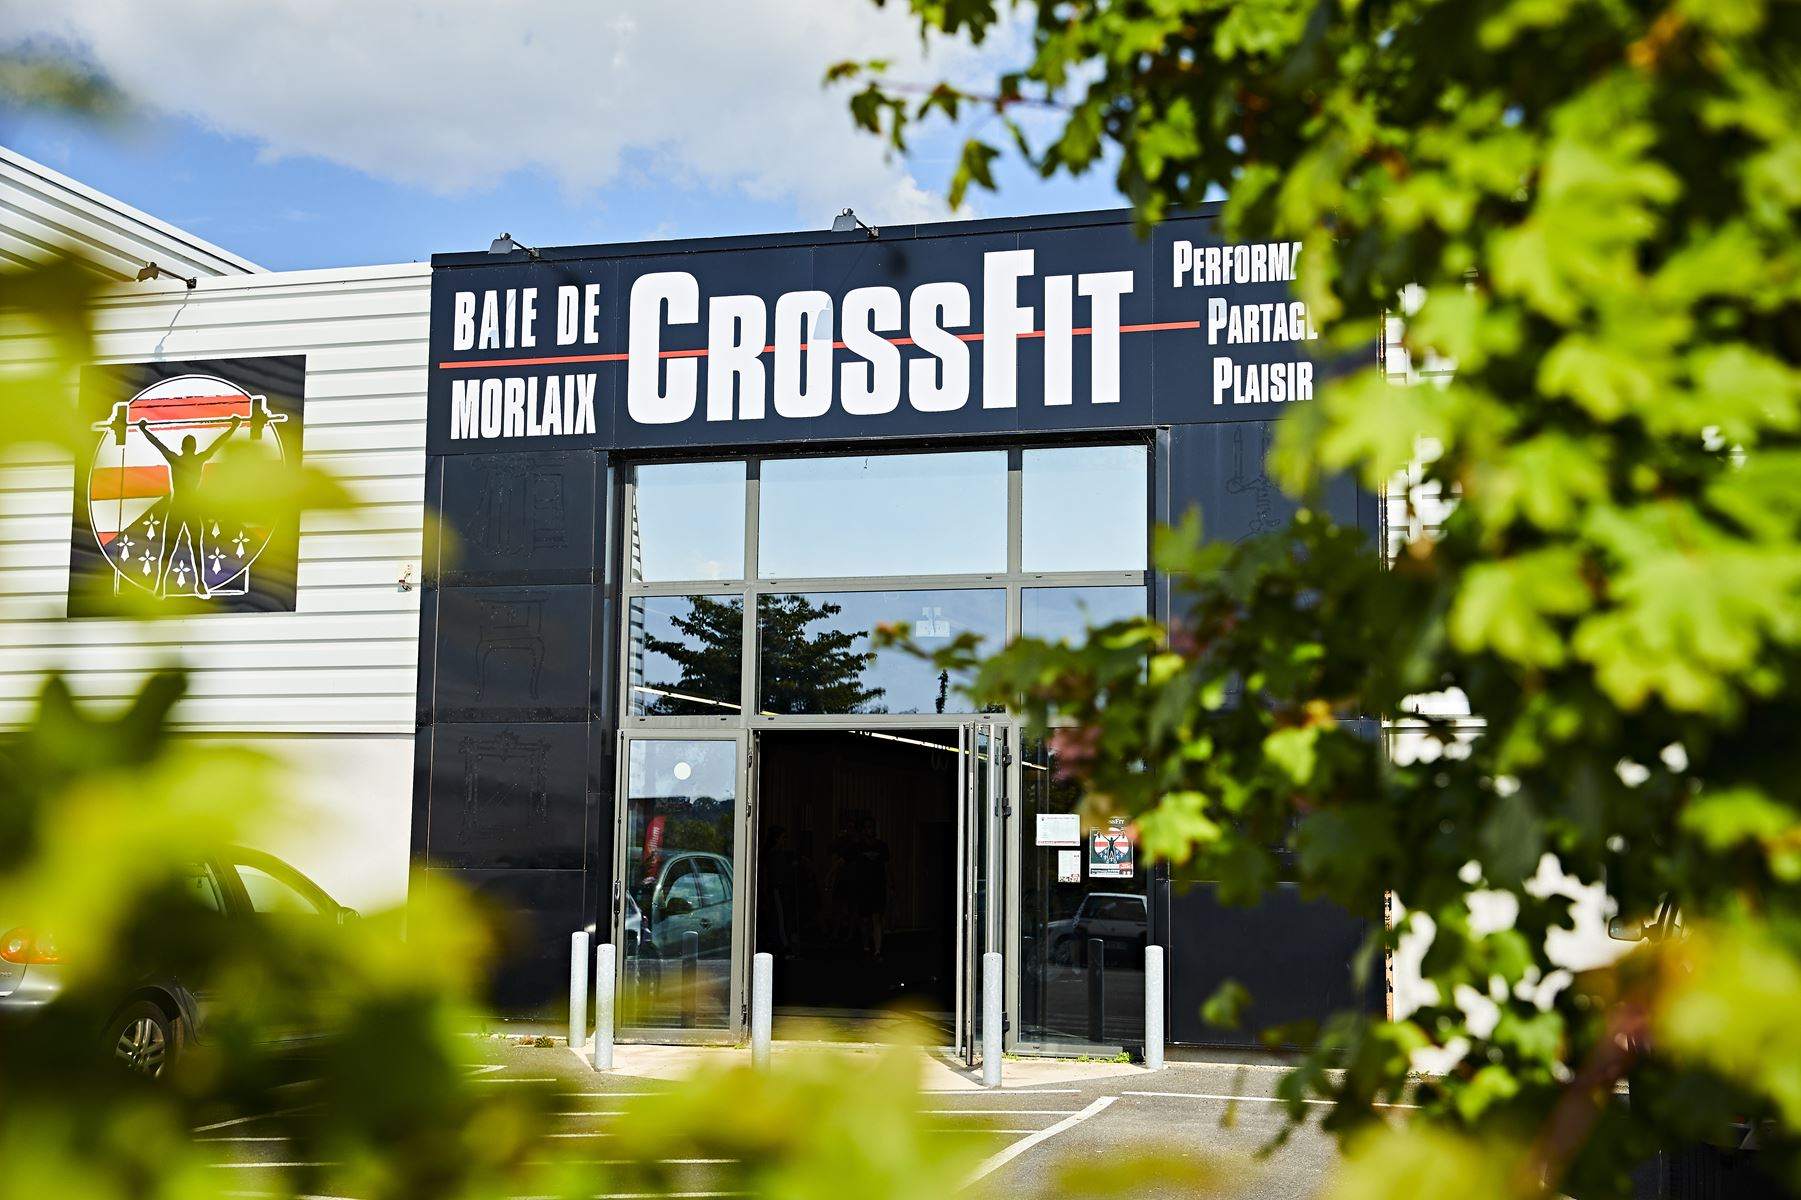 La Box CrossFit Baie de Morlaix